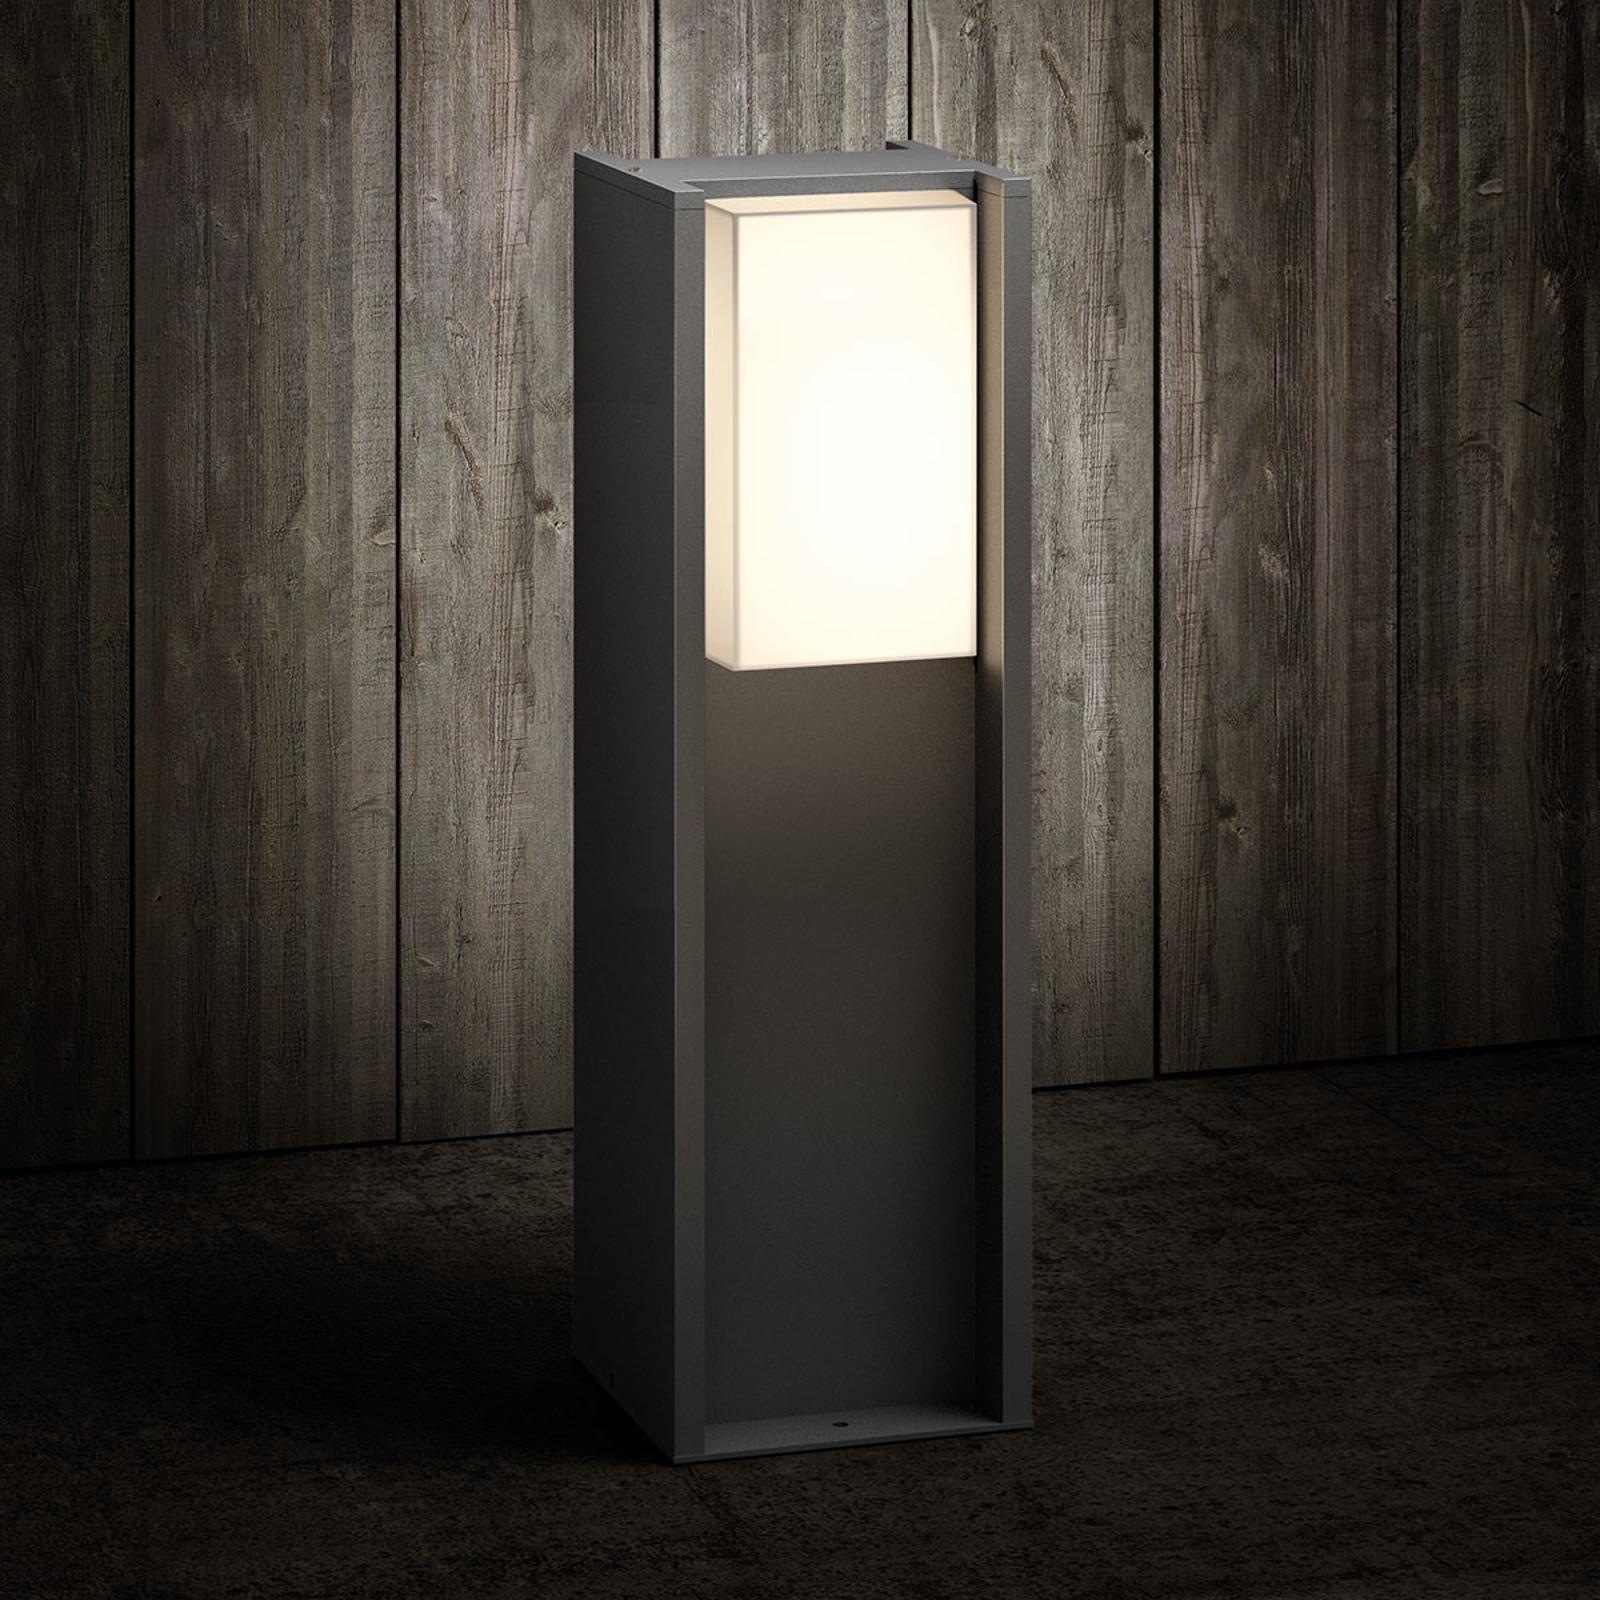 Philips Hue LED-sokkellampe Turaco – styrbar